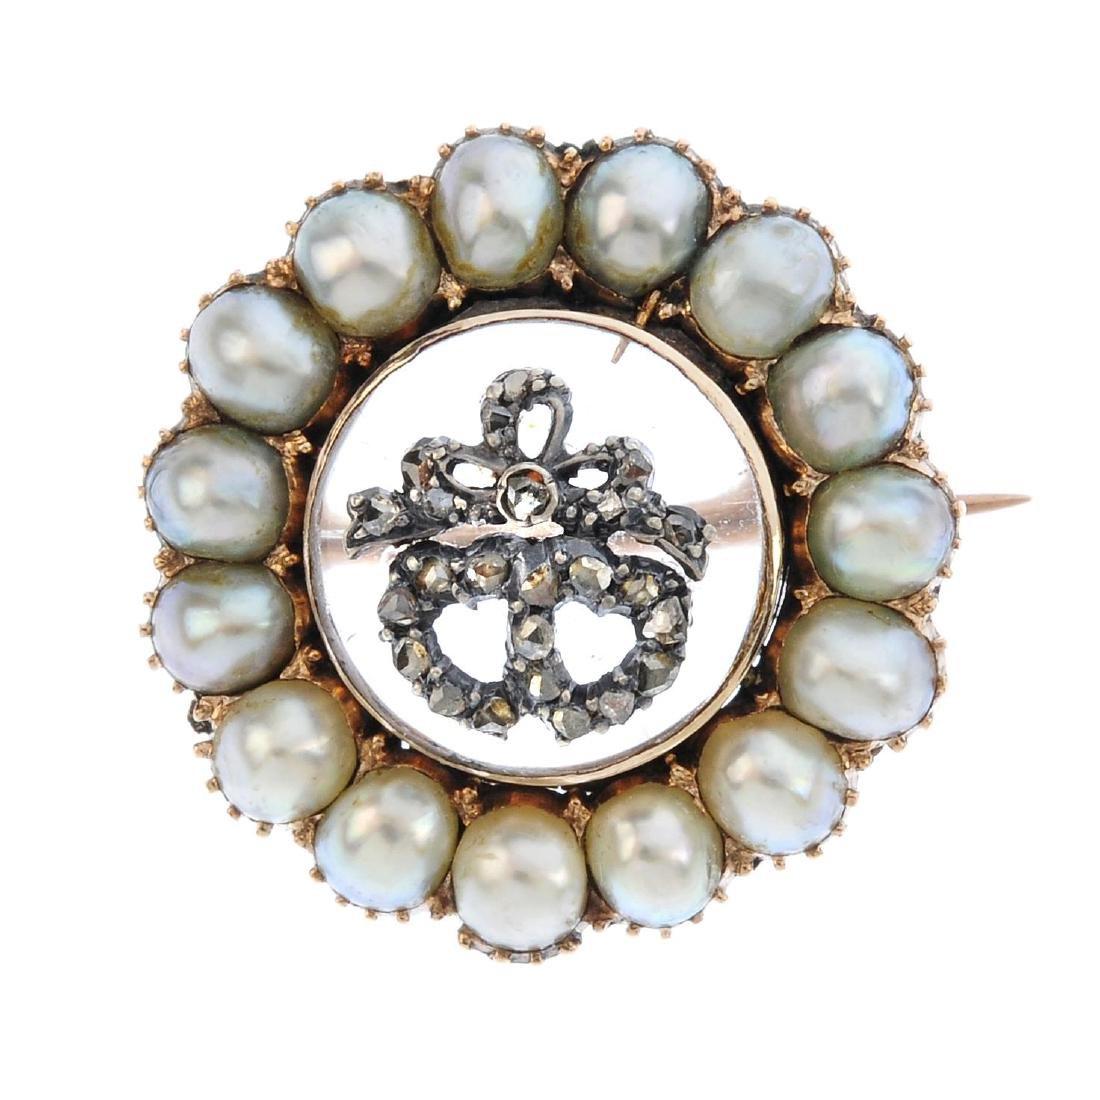 A mid Victorian gold, diamond and gem-set sentimental